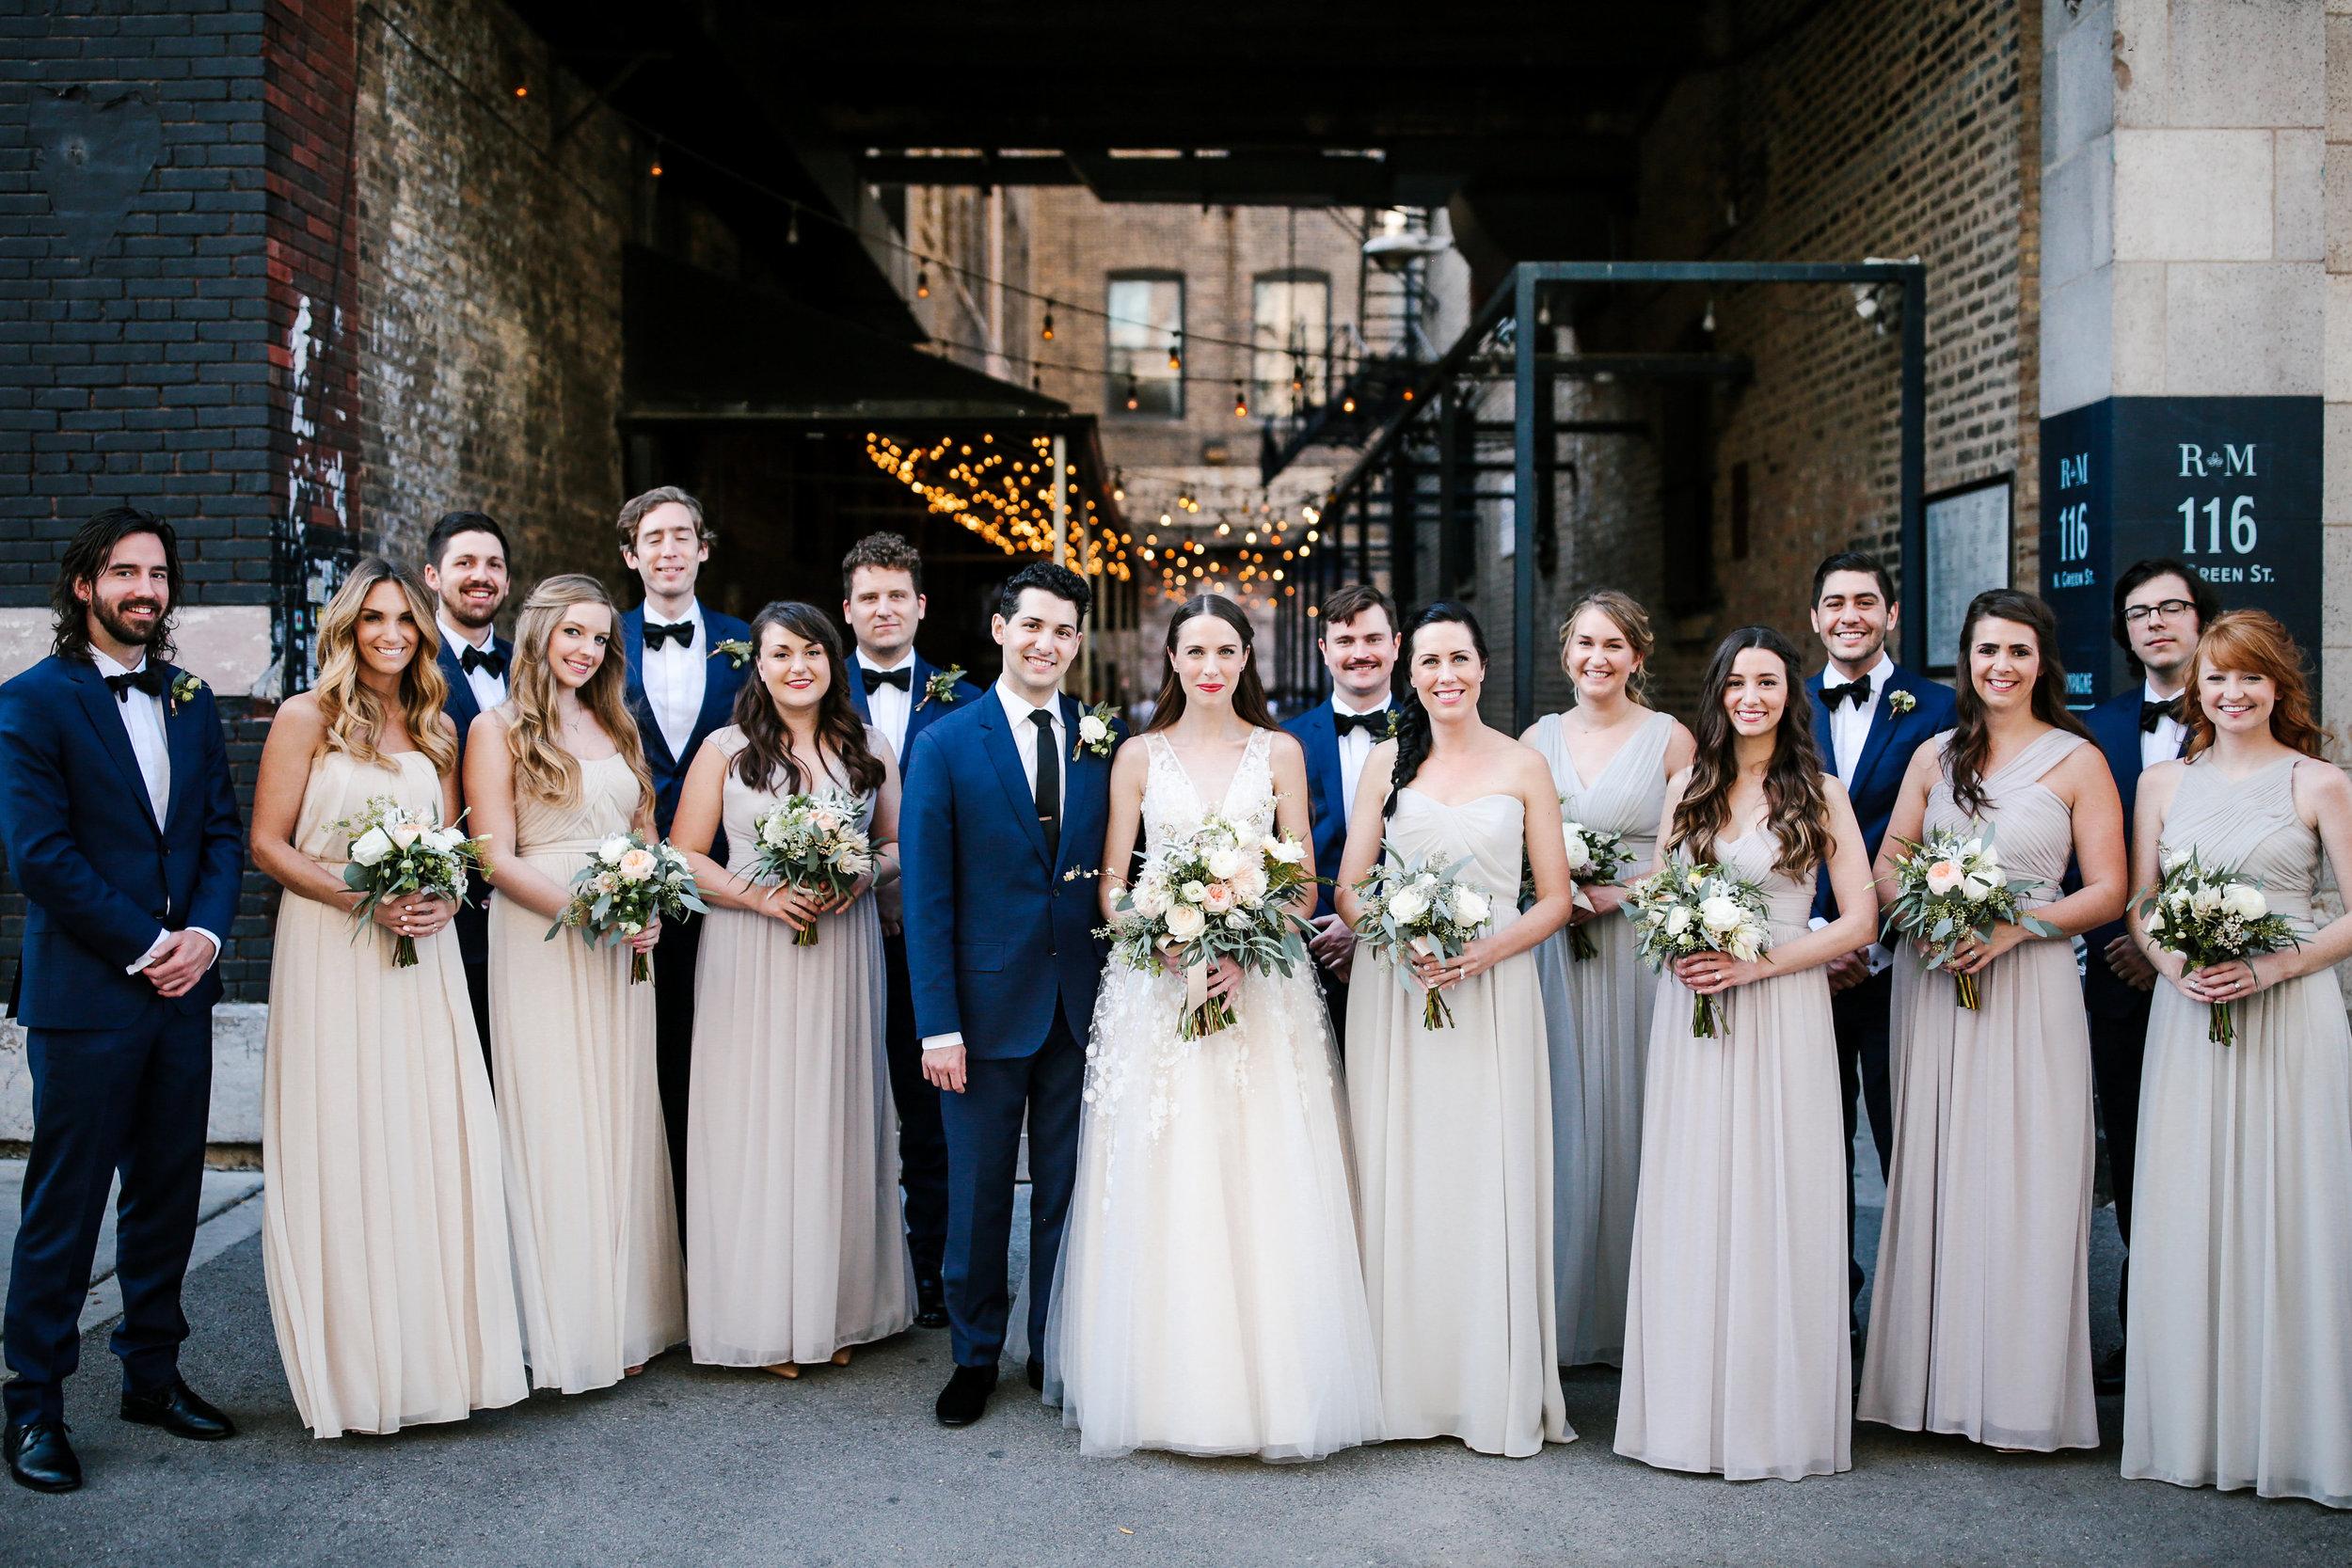 Wedding-Photo-164.jpg